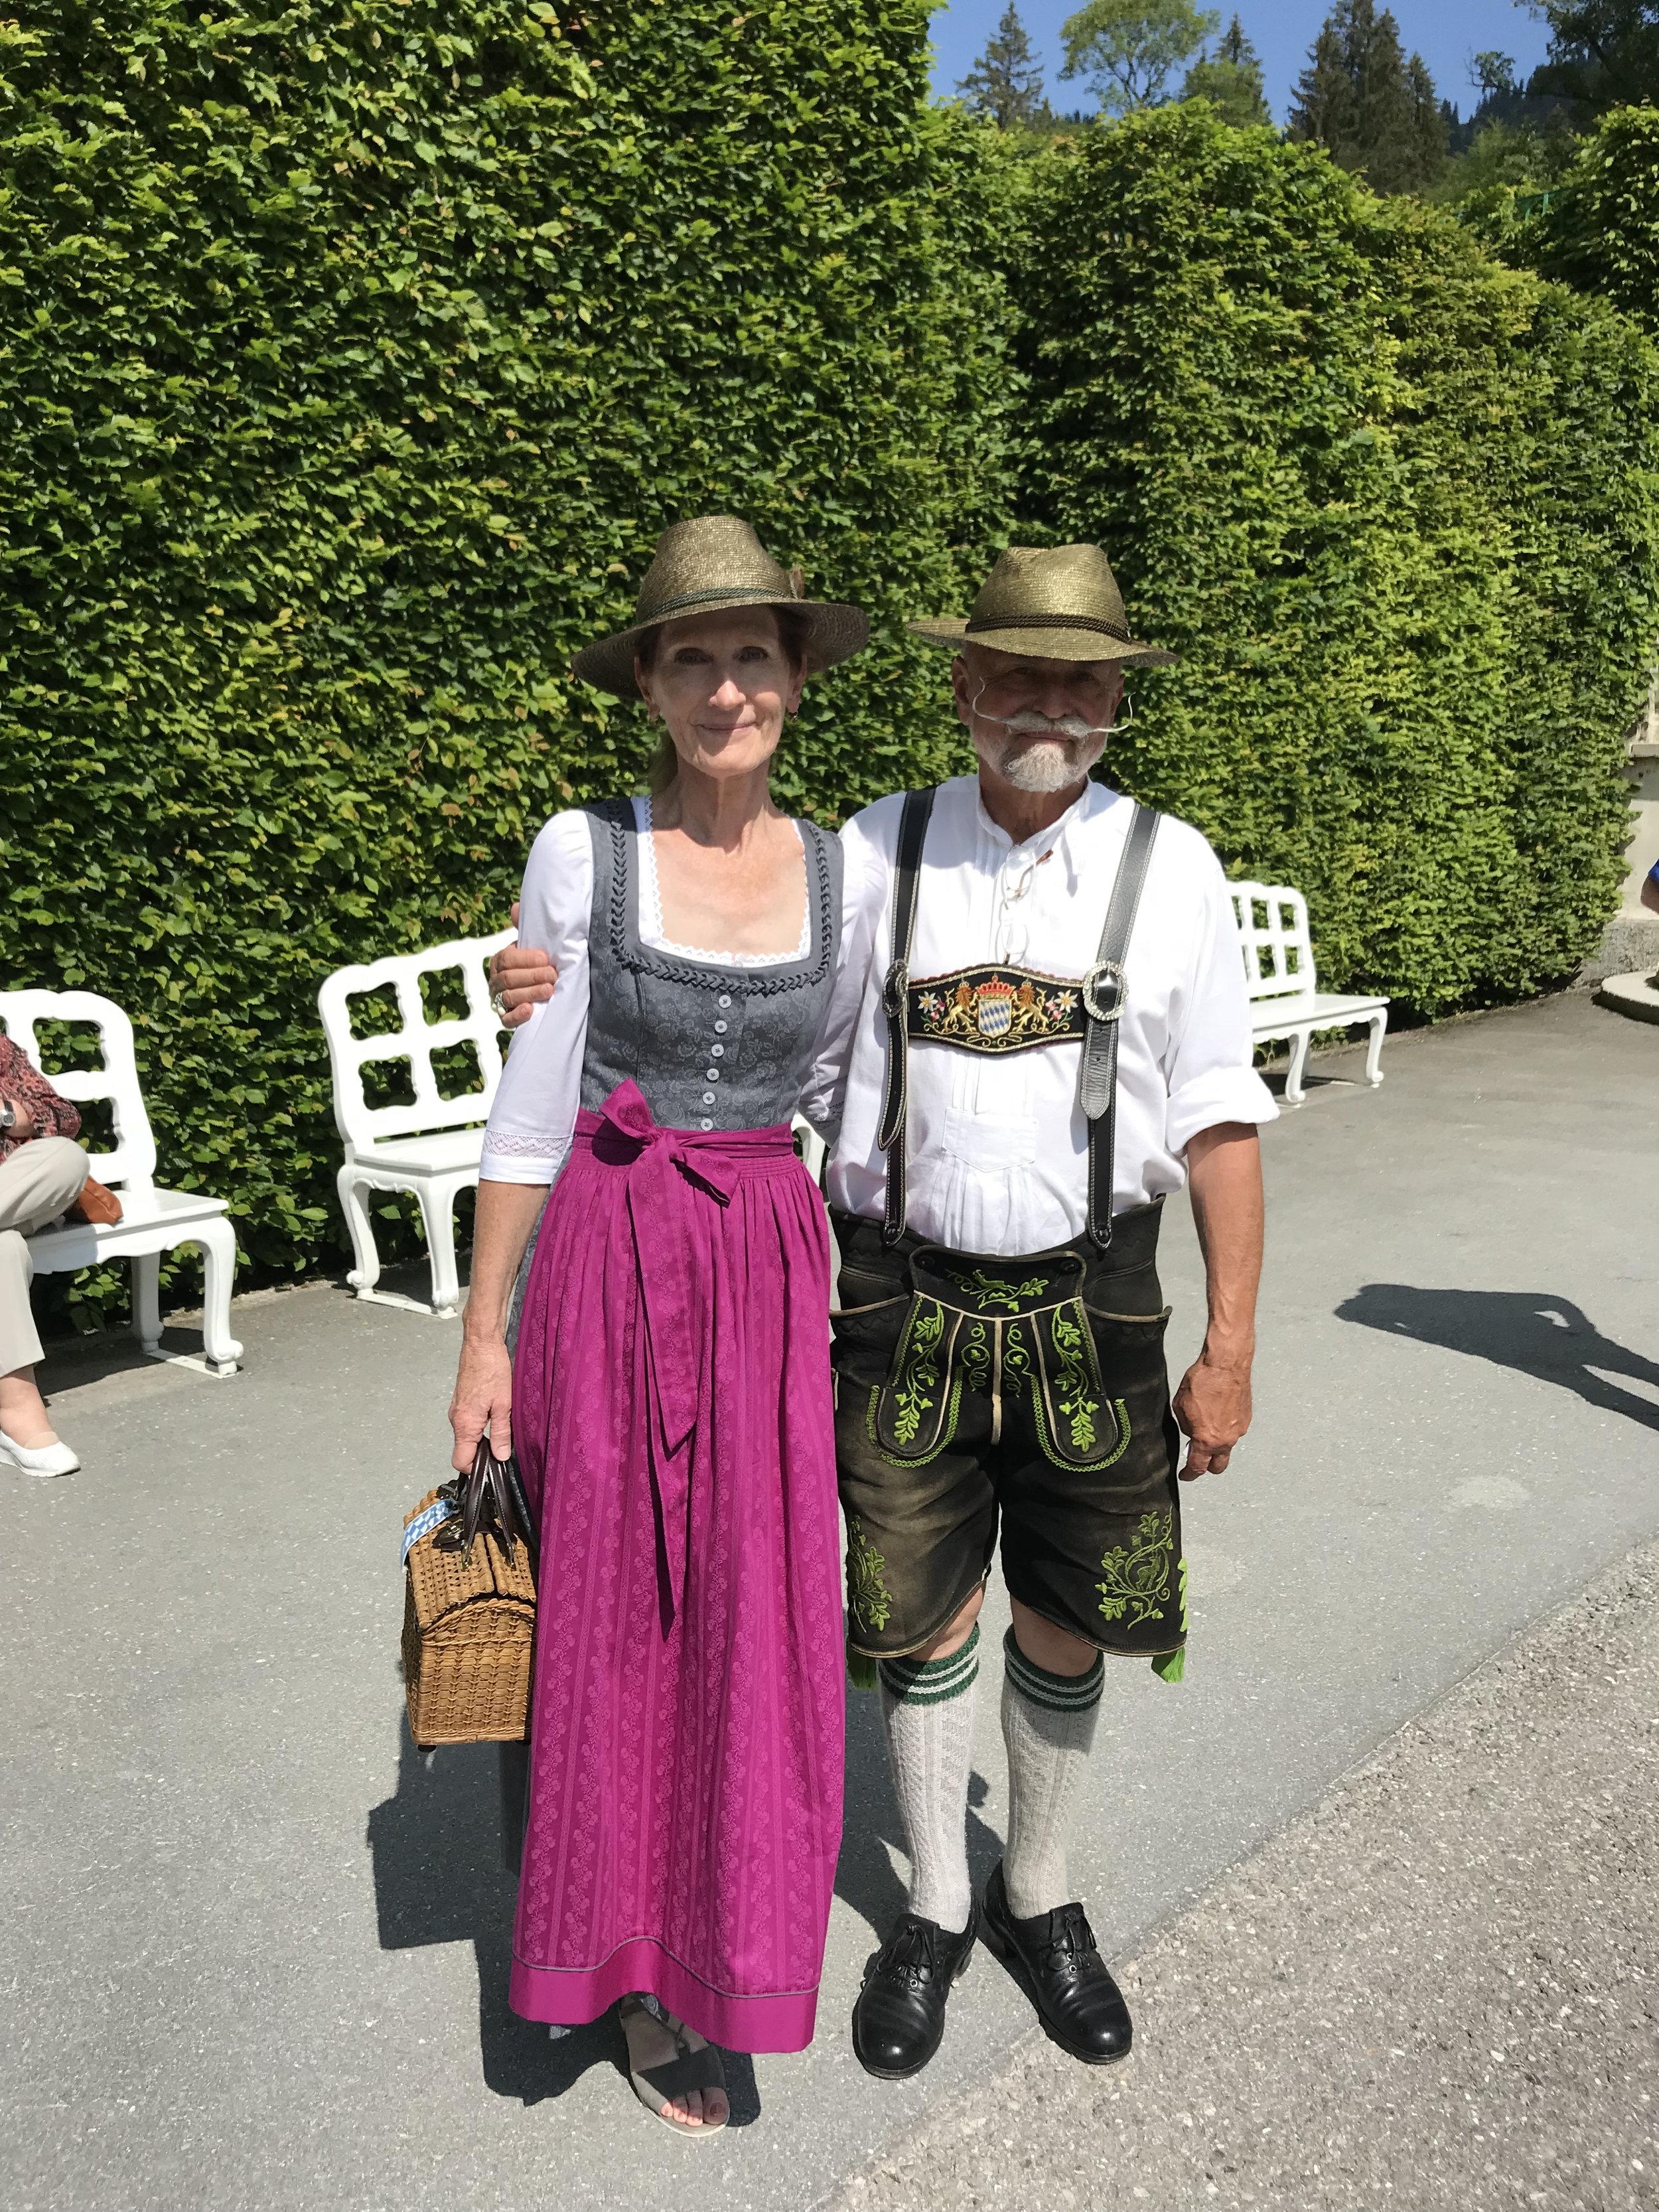 Teri_Day2_Castles_Germany&Austria_spiritedtable_photo42.jpg